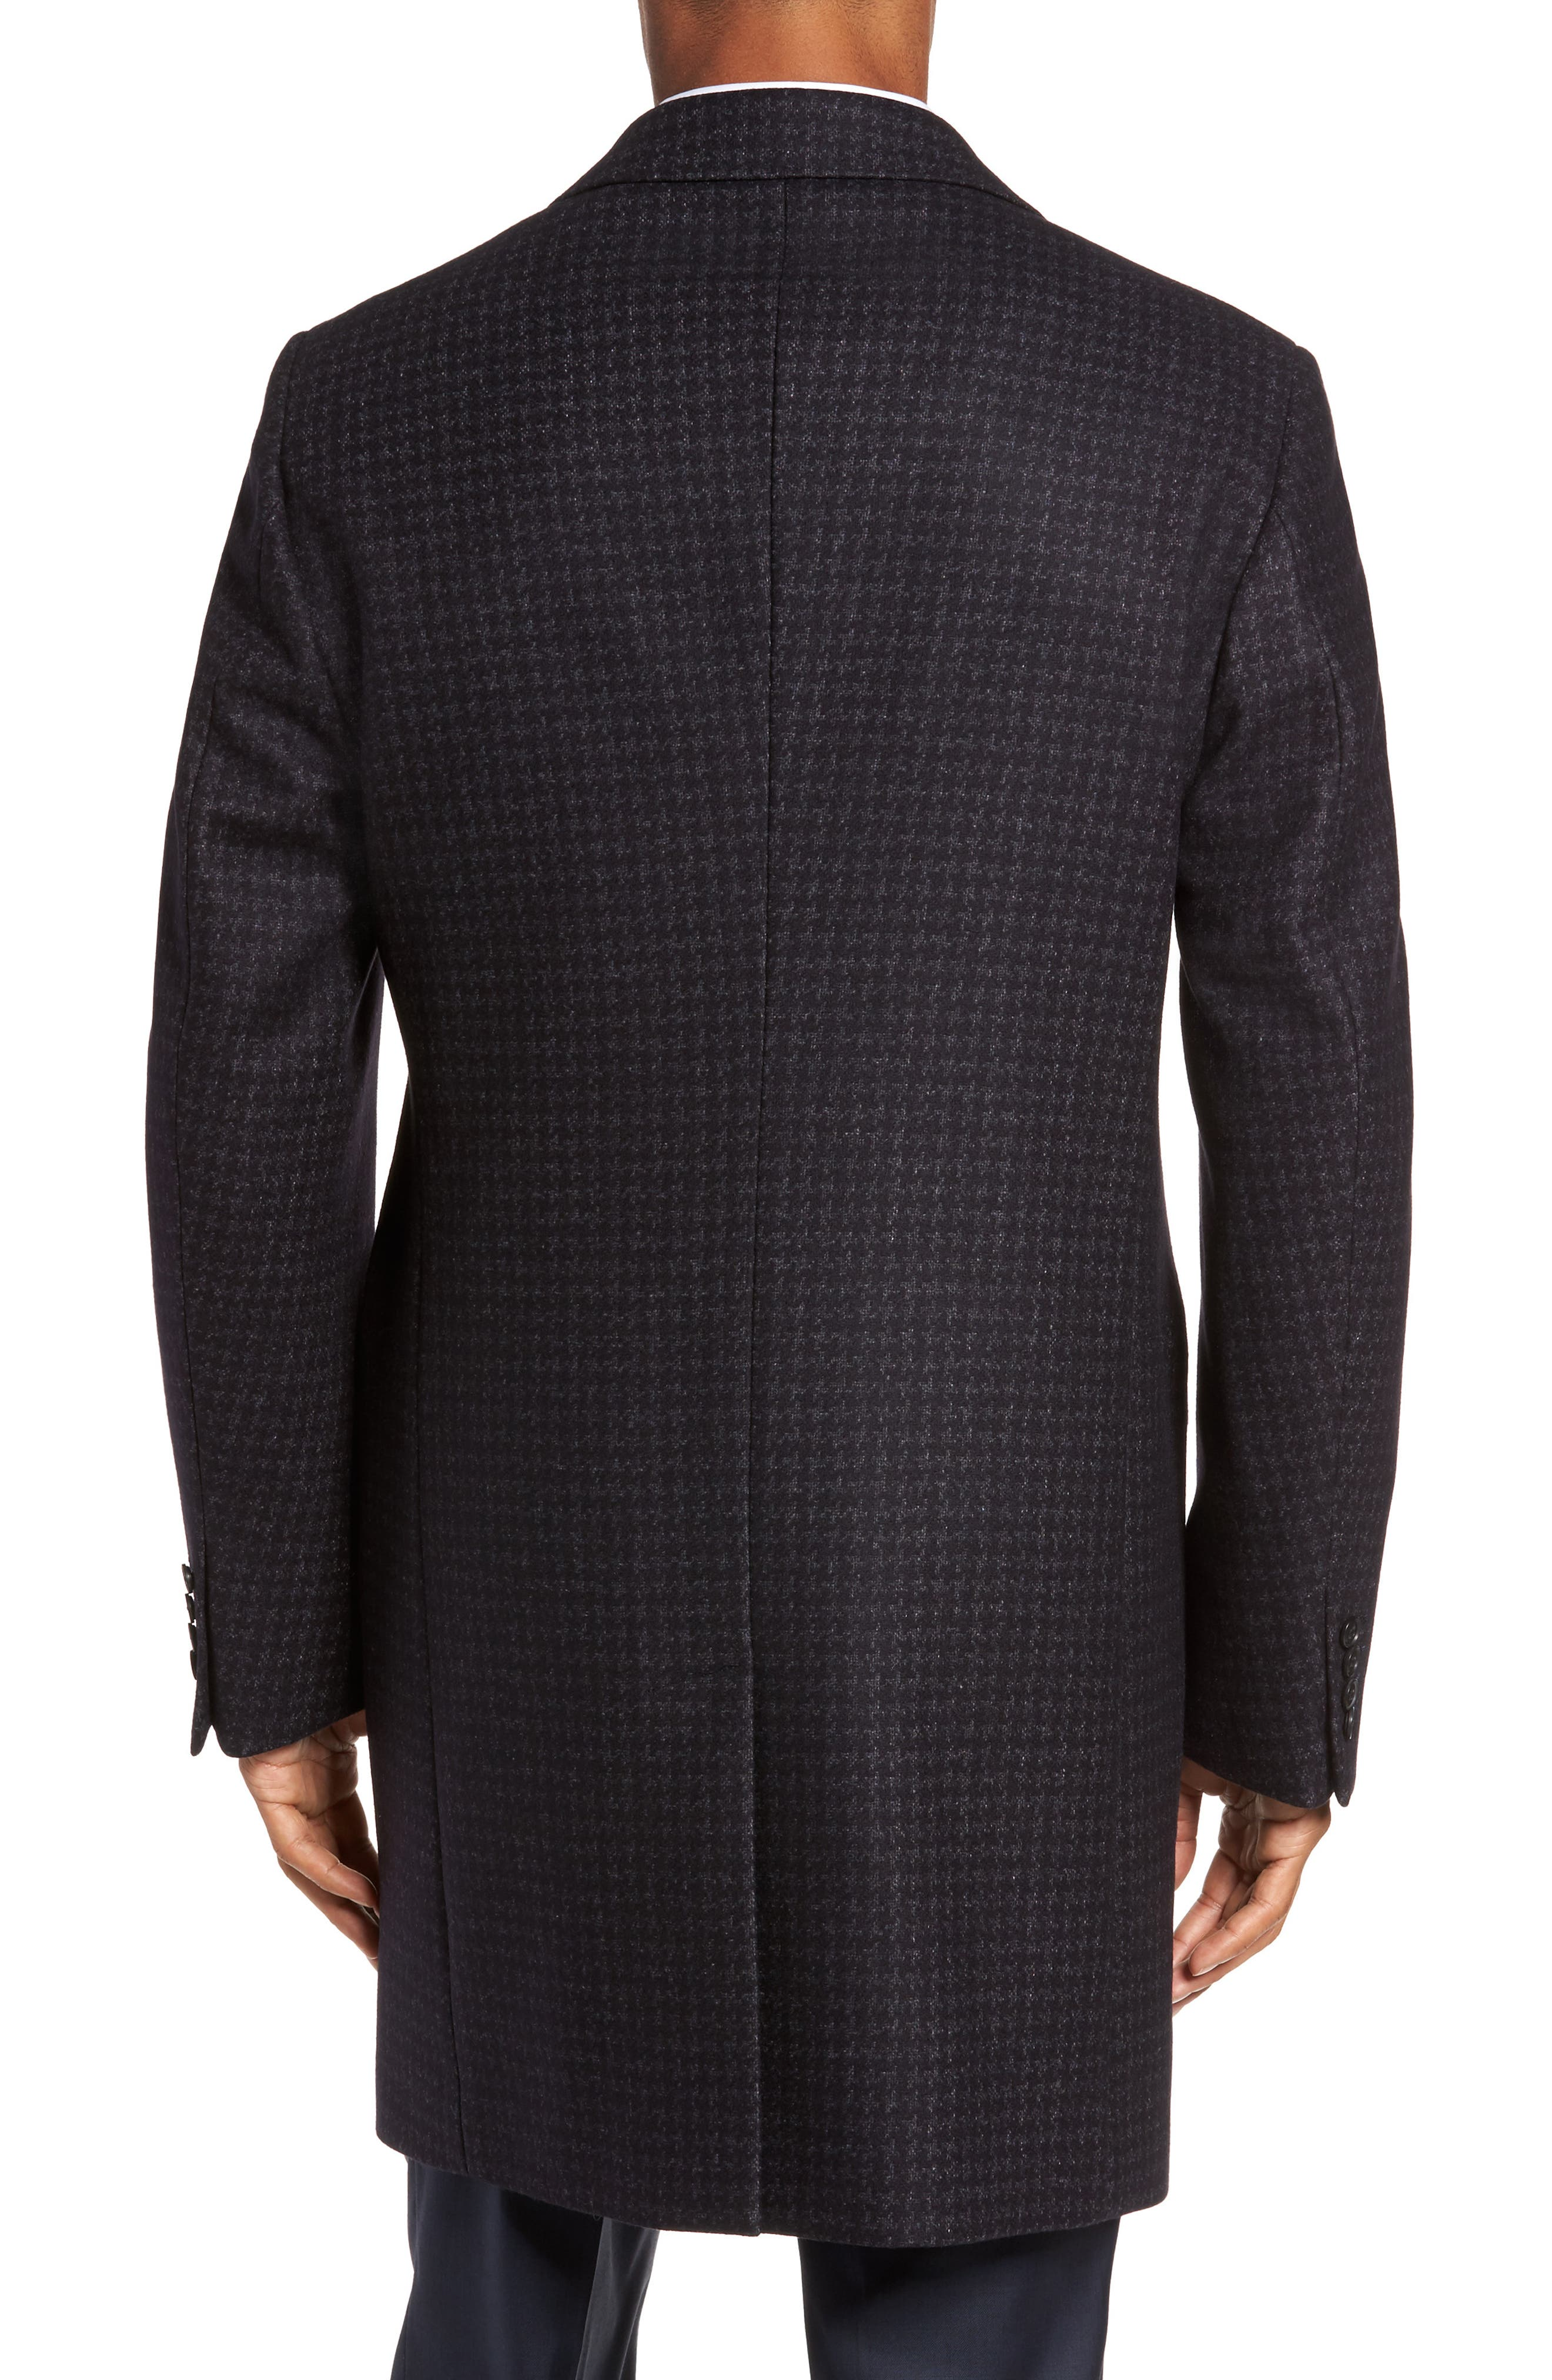 Jackson Houndstooth Wool Blend Overcoat,                             Alternate thumbnail 2, color,